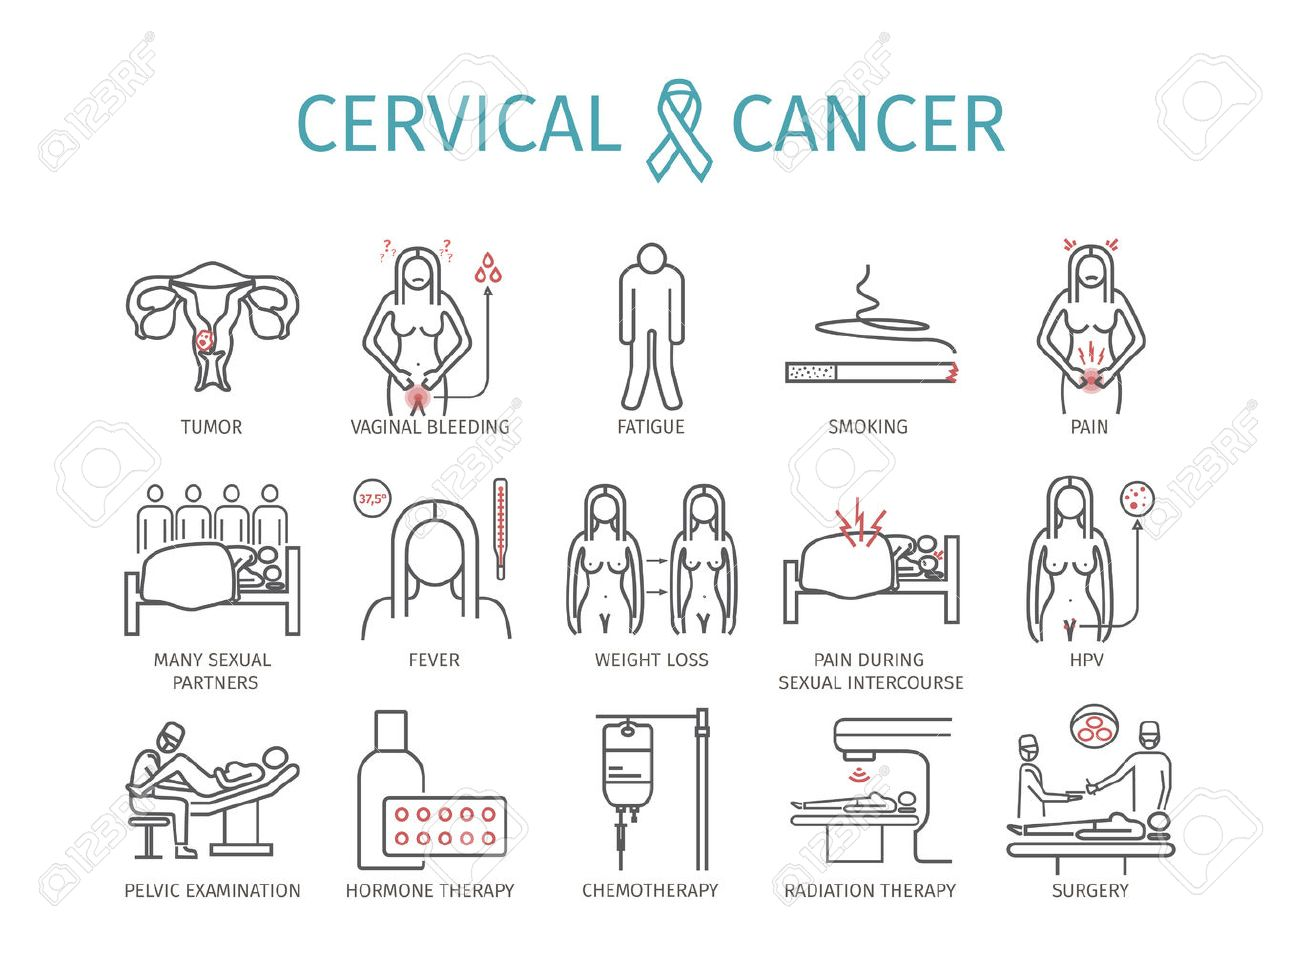 Cervical cancer: symptoms, causes, treatment